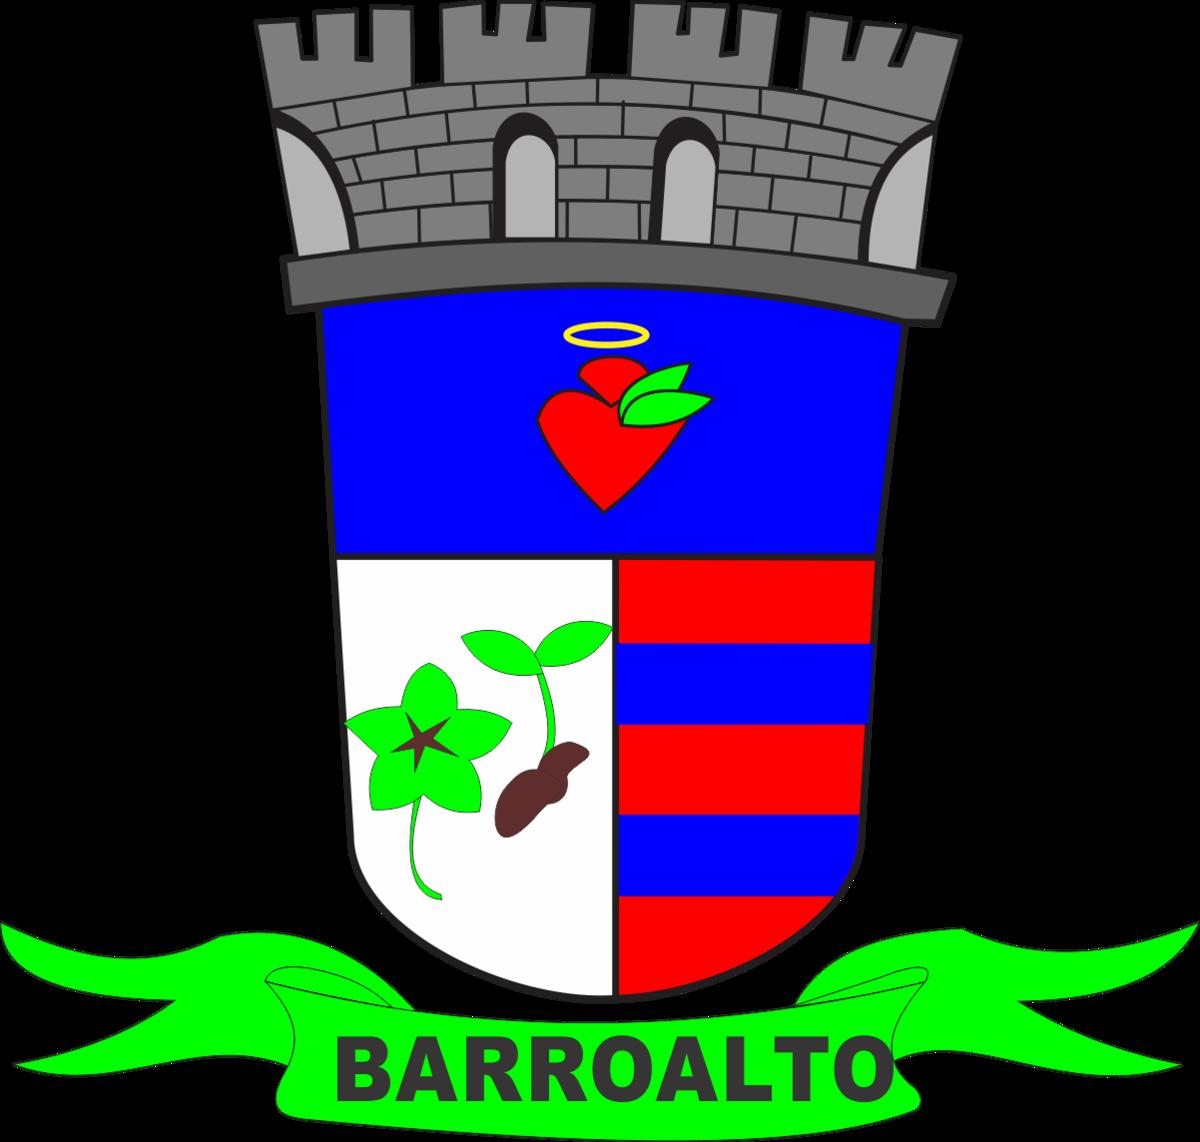 Barro Alto Bahia fonte: upload.wikimedia.org